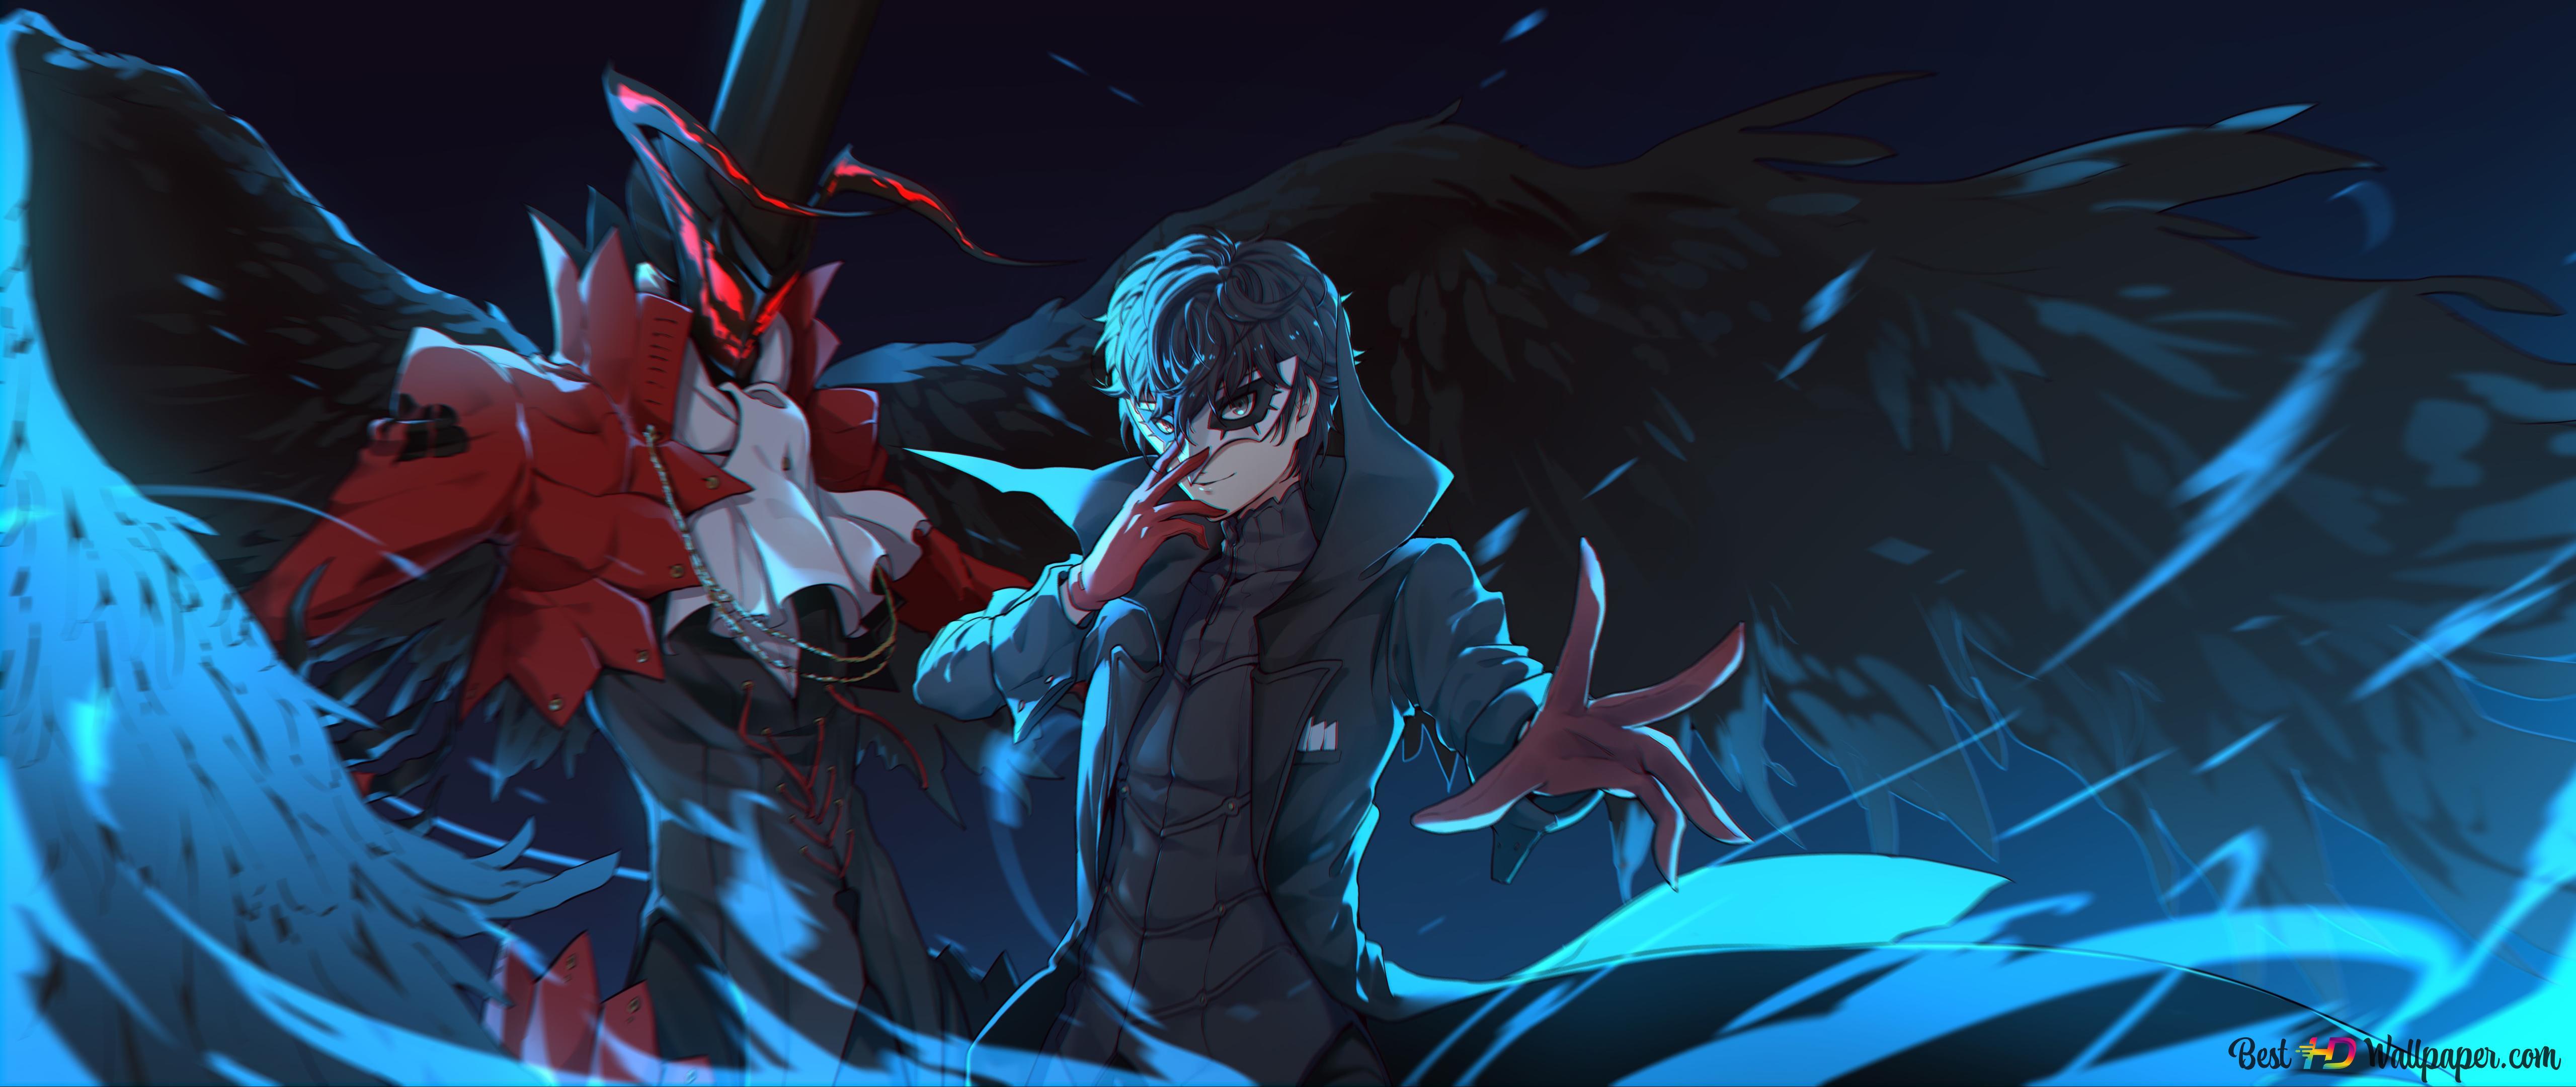 Persona 5 The Animation Ren Amamiya Akira Kurusu Hd Wallpaper Download